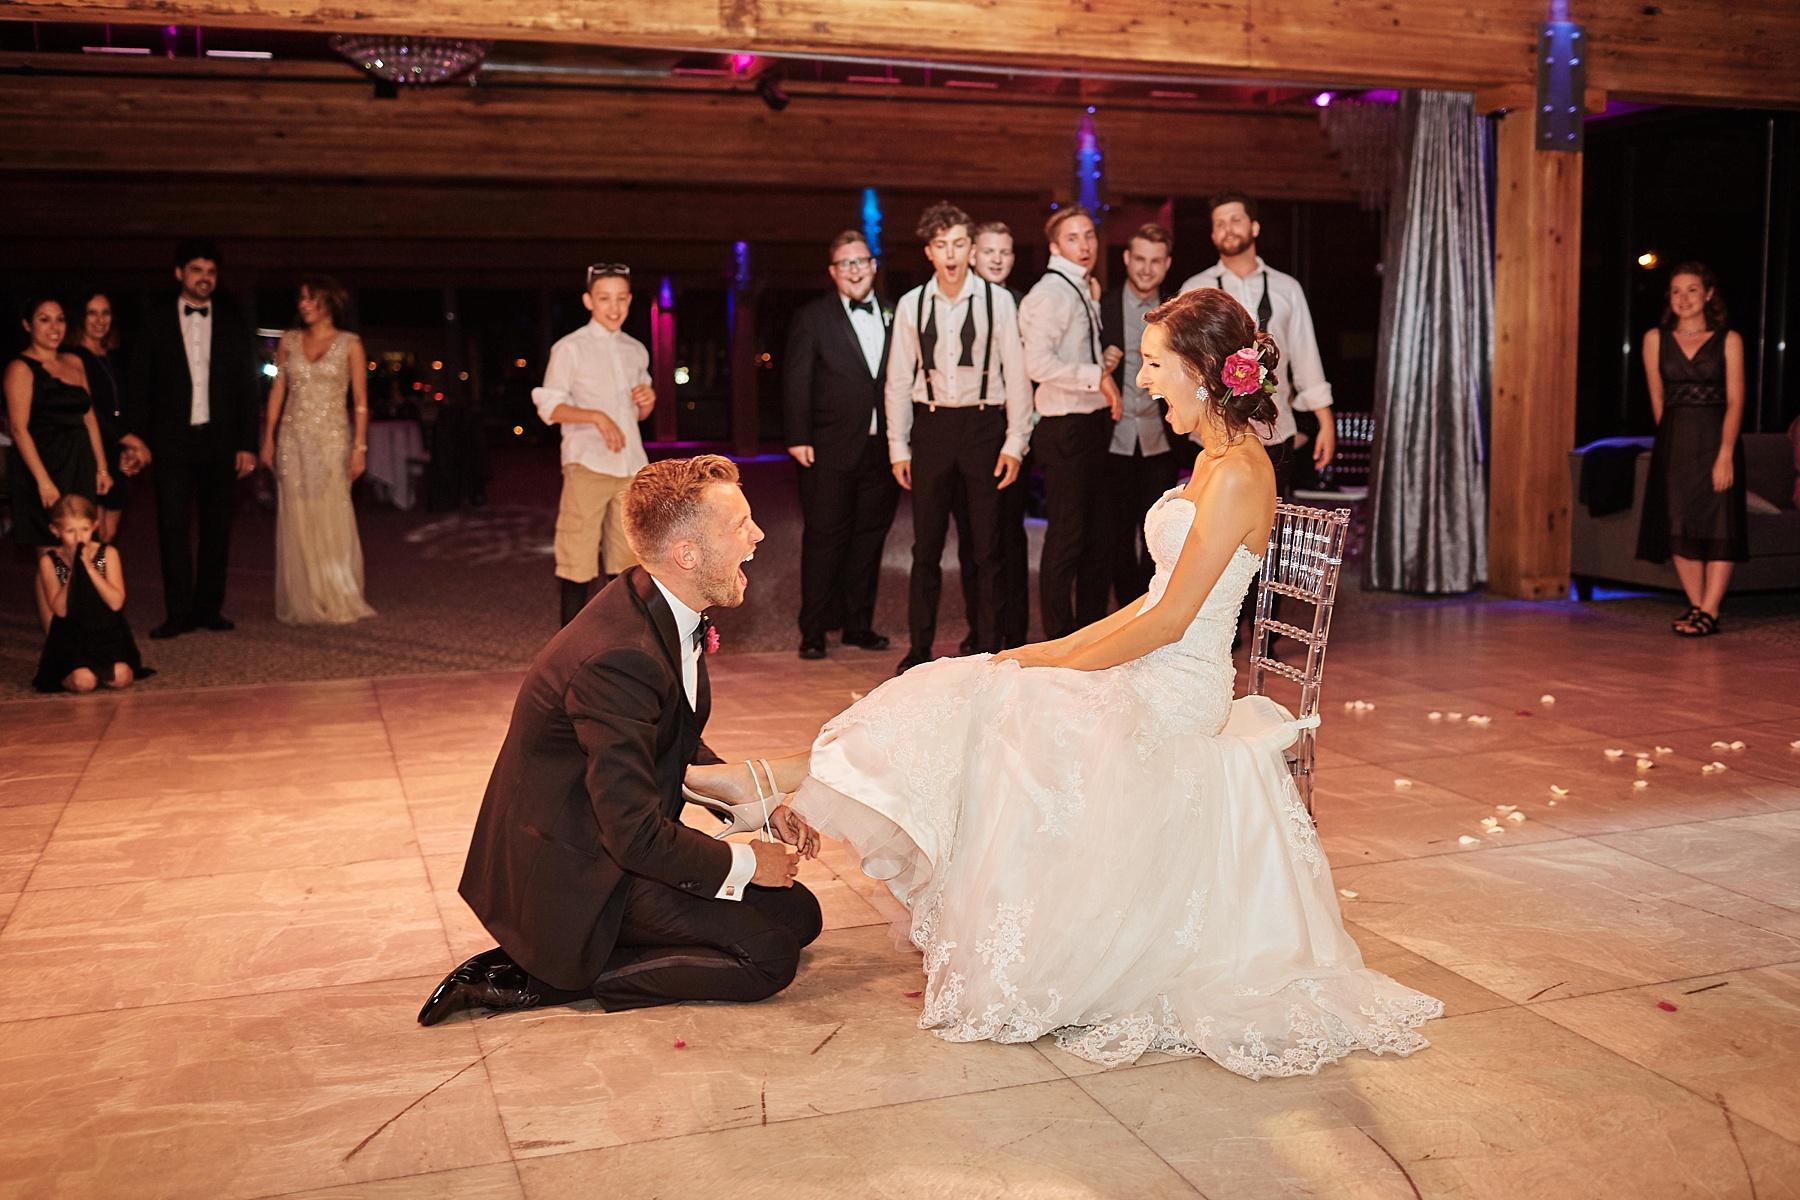 ABULAE-Wedding-Saint-paul-MN-Josh-Sofia-Wedding-Mears-Park_0865.jpg